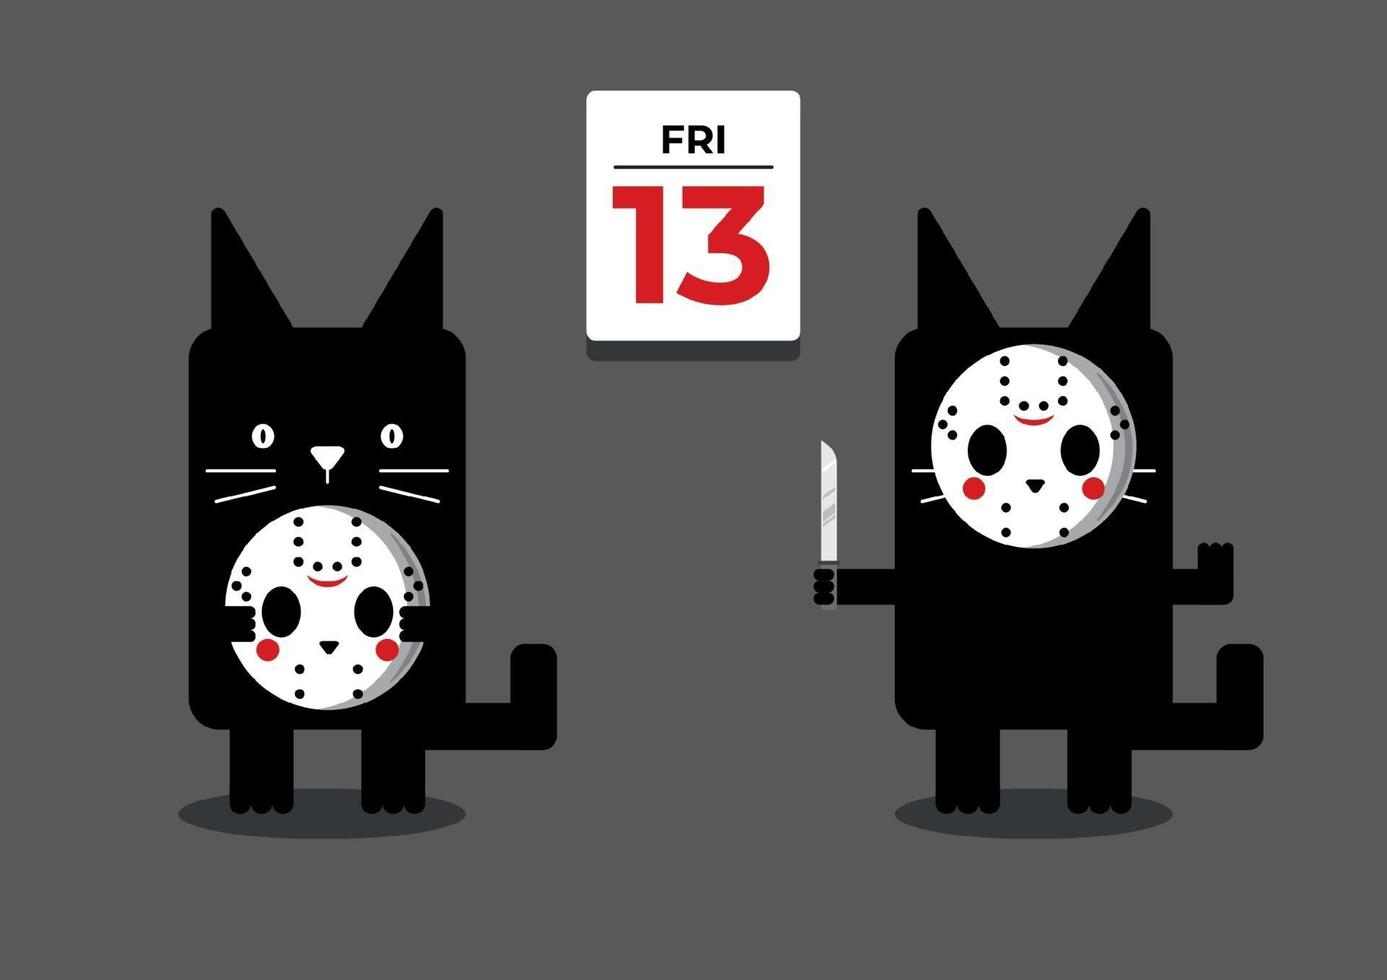 Freitag die 13. schwarze Katze vektor